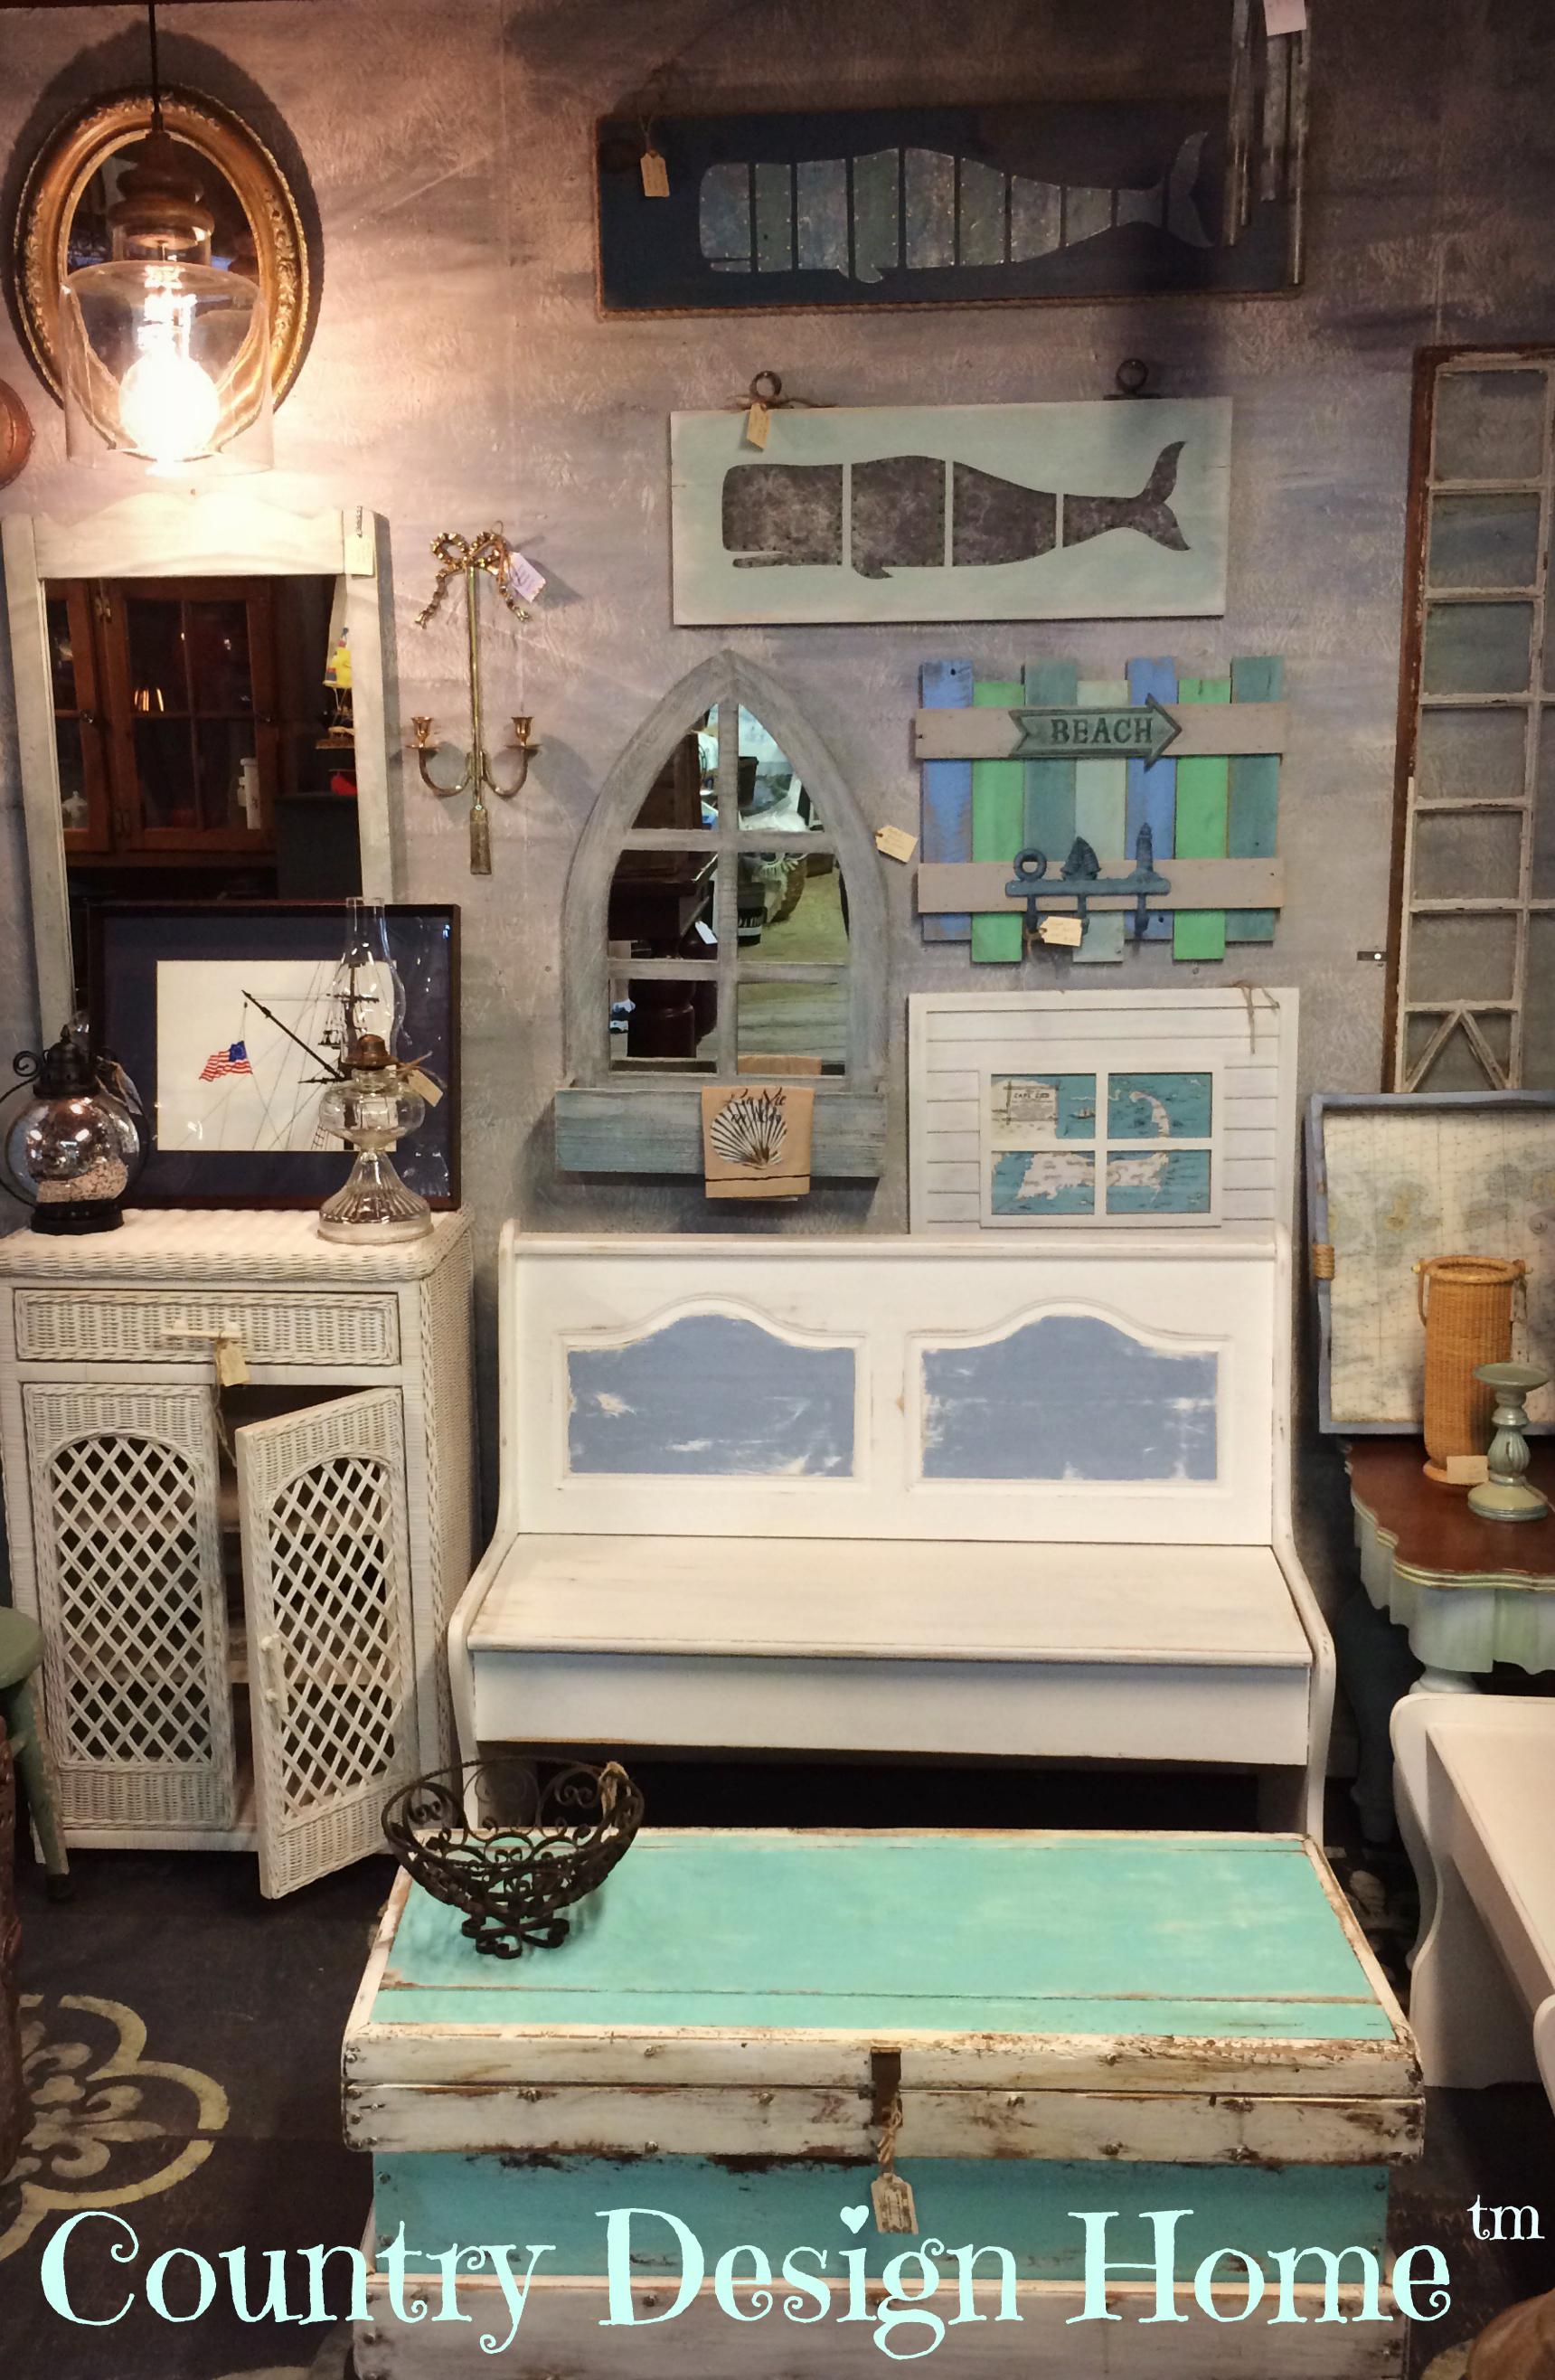 Beau Tin Whales Barn Vignette Country Design Home